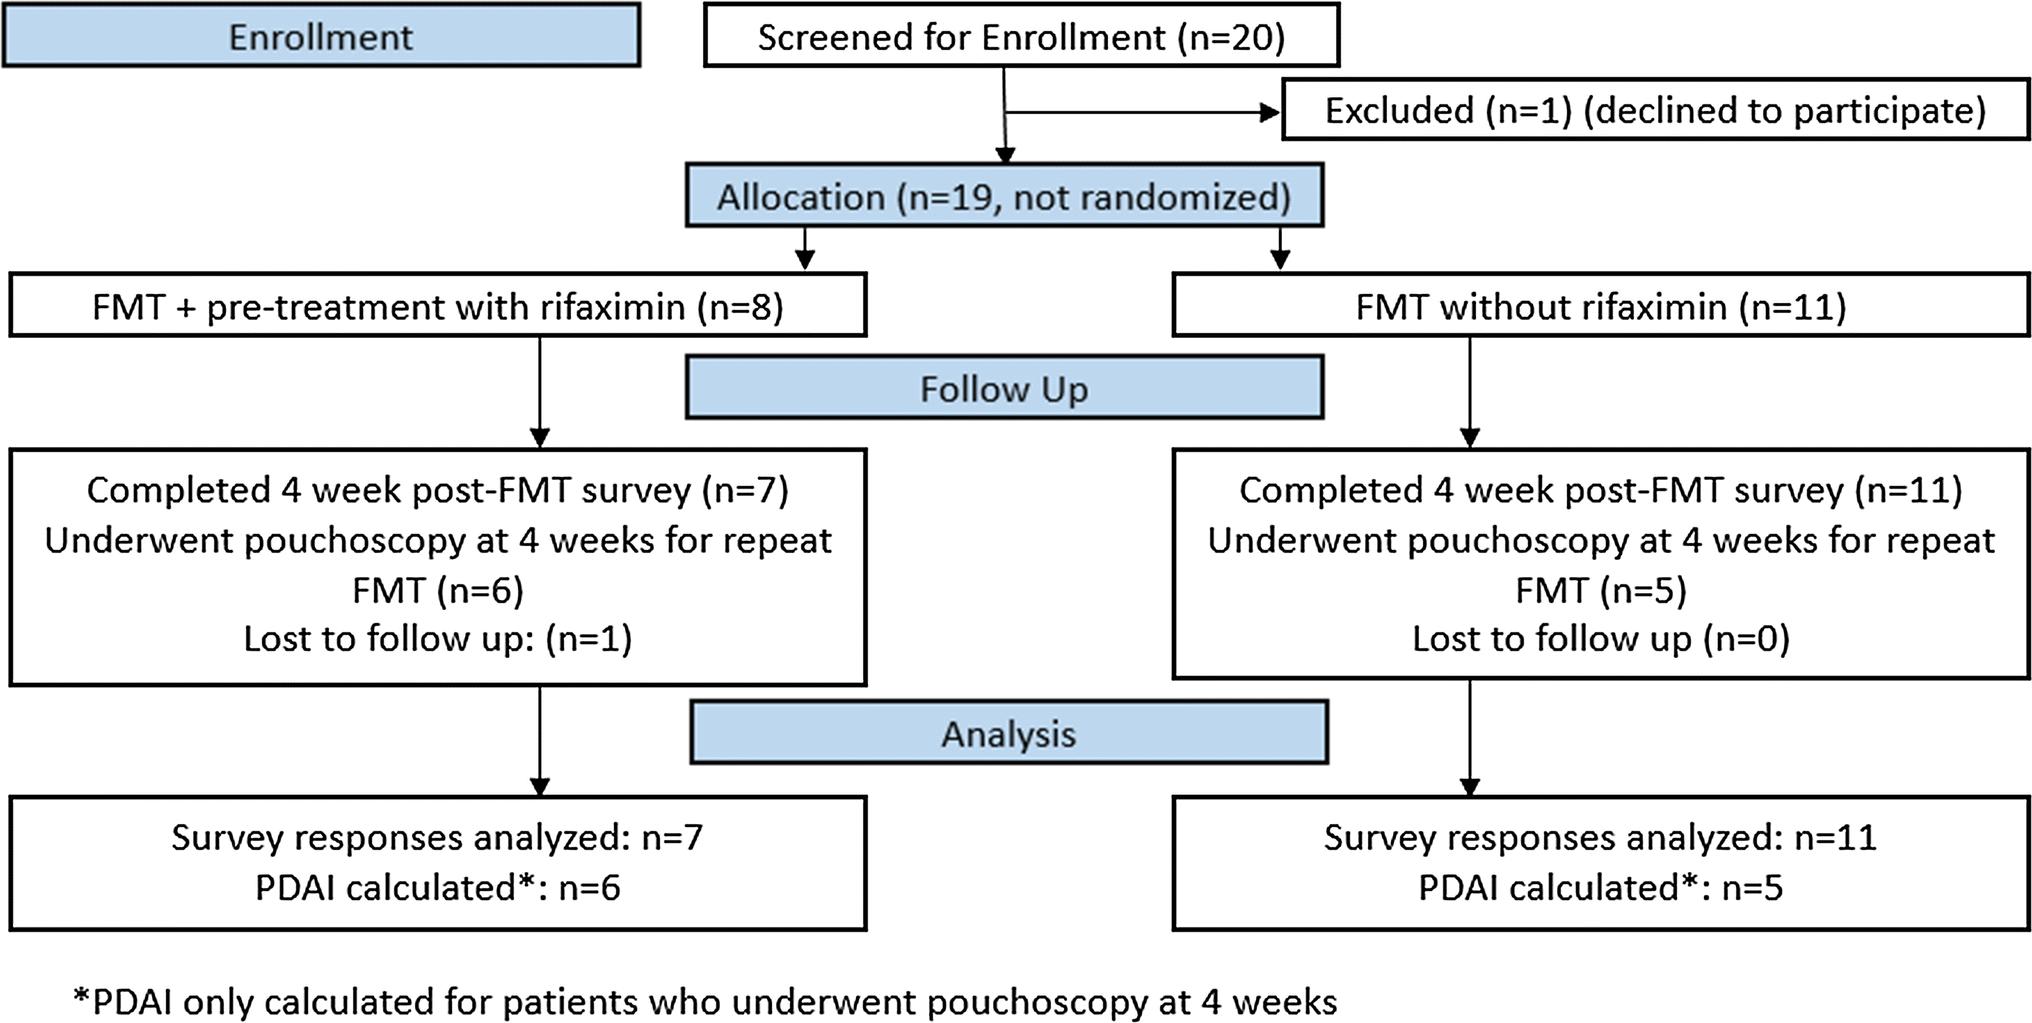 Fecal Microbiota Transplantation in Pouchitis: Clinical, Endoscopic